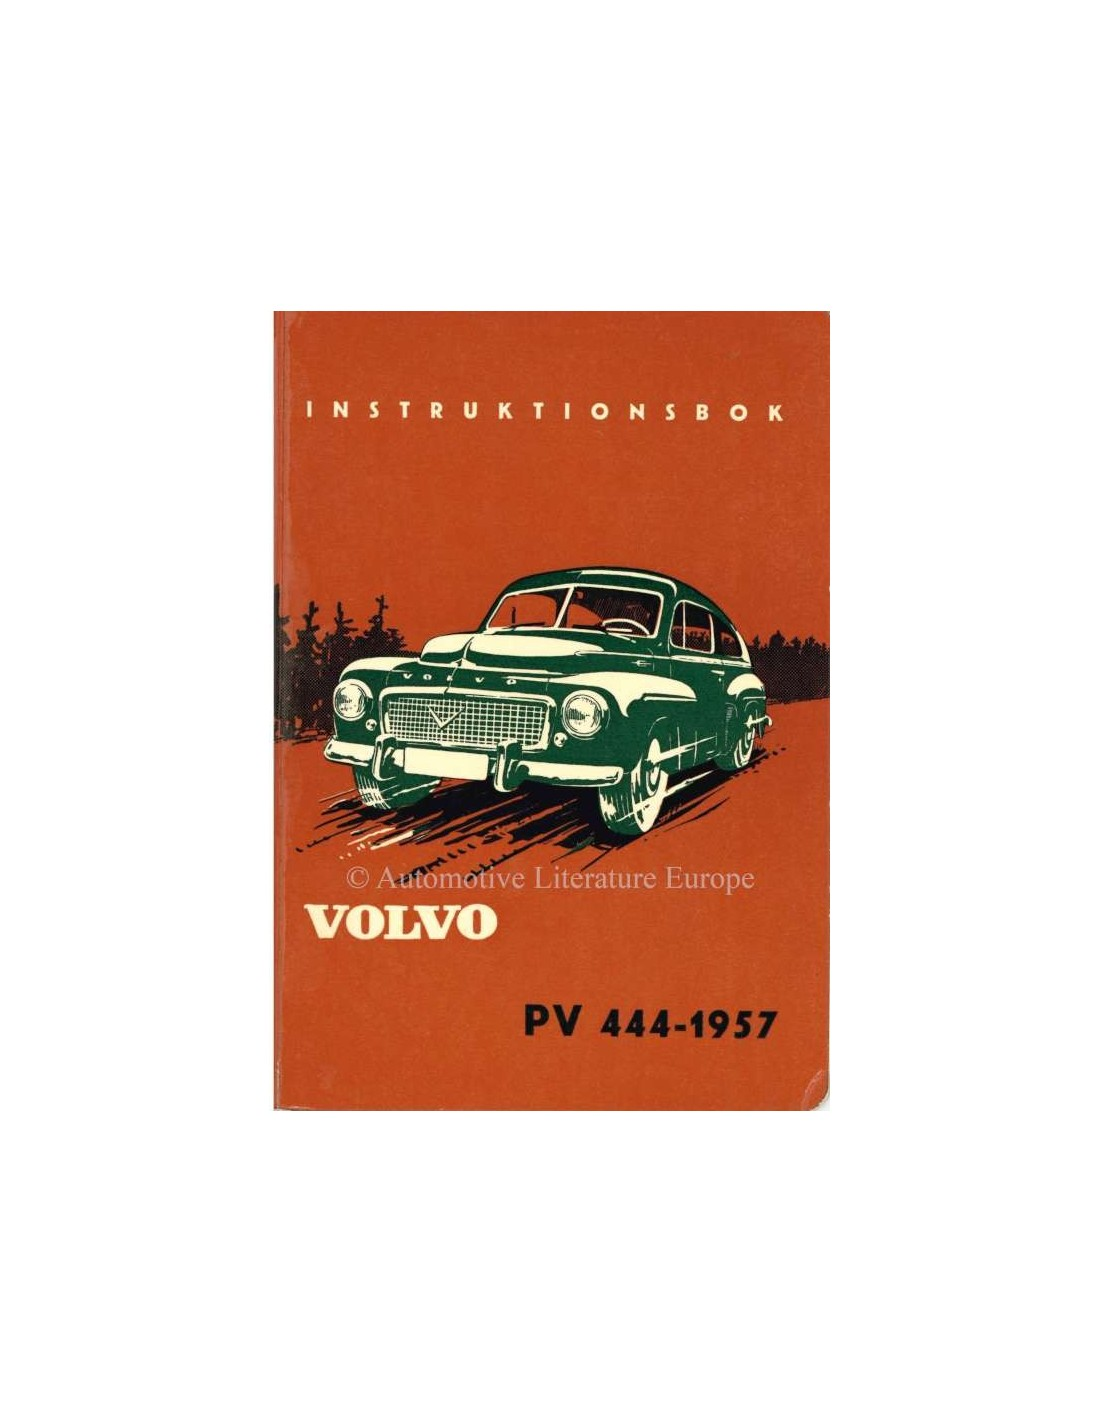 1957 volvo pv 444 owners manual swedish rh autolit eu Volvo 122 Volvo PV544 Hot Rods